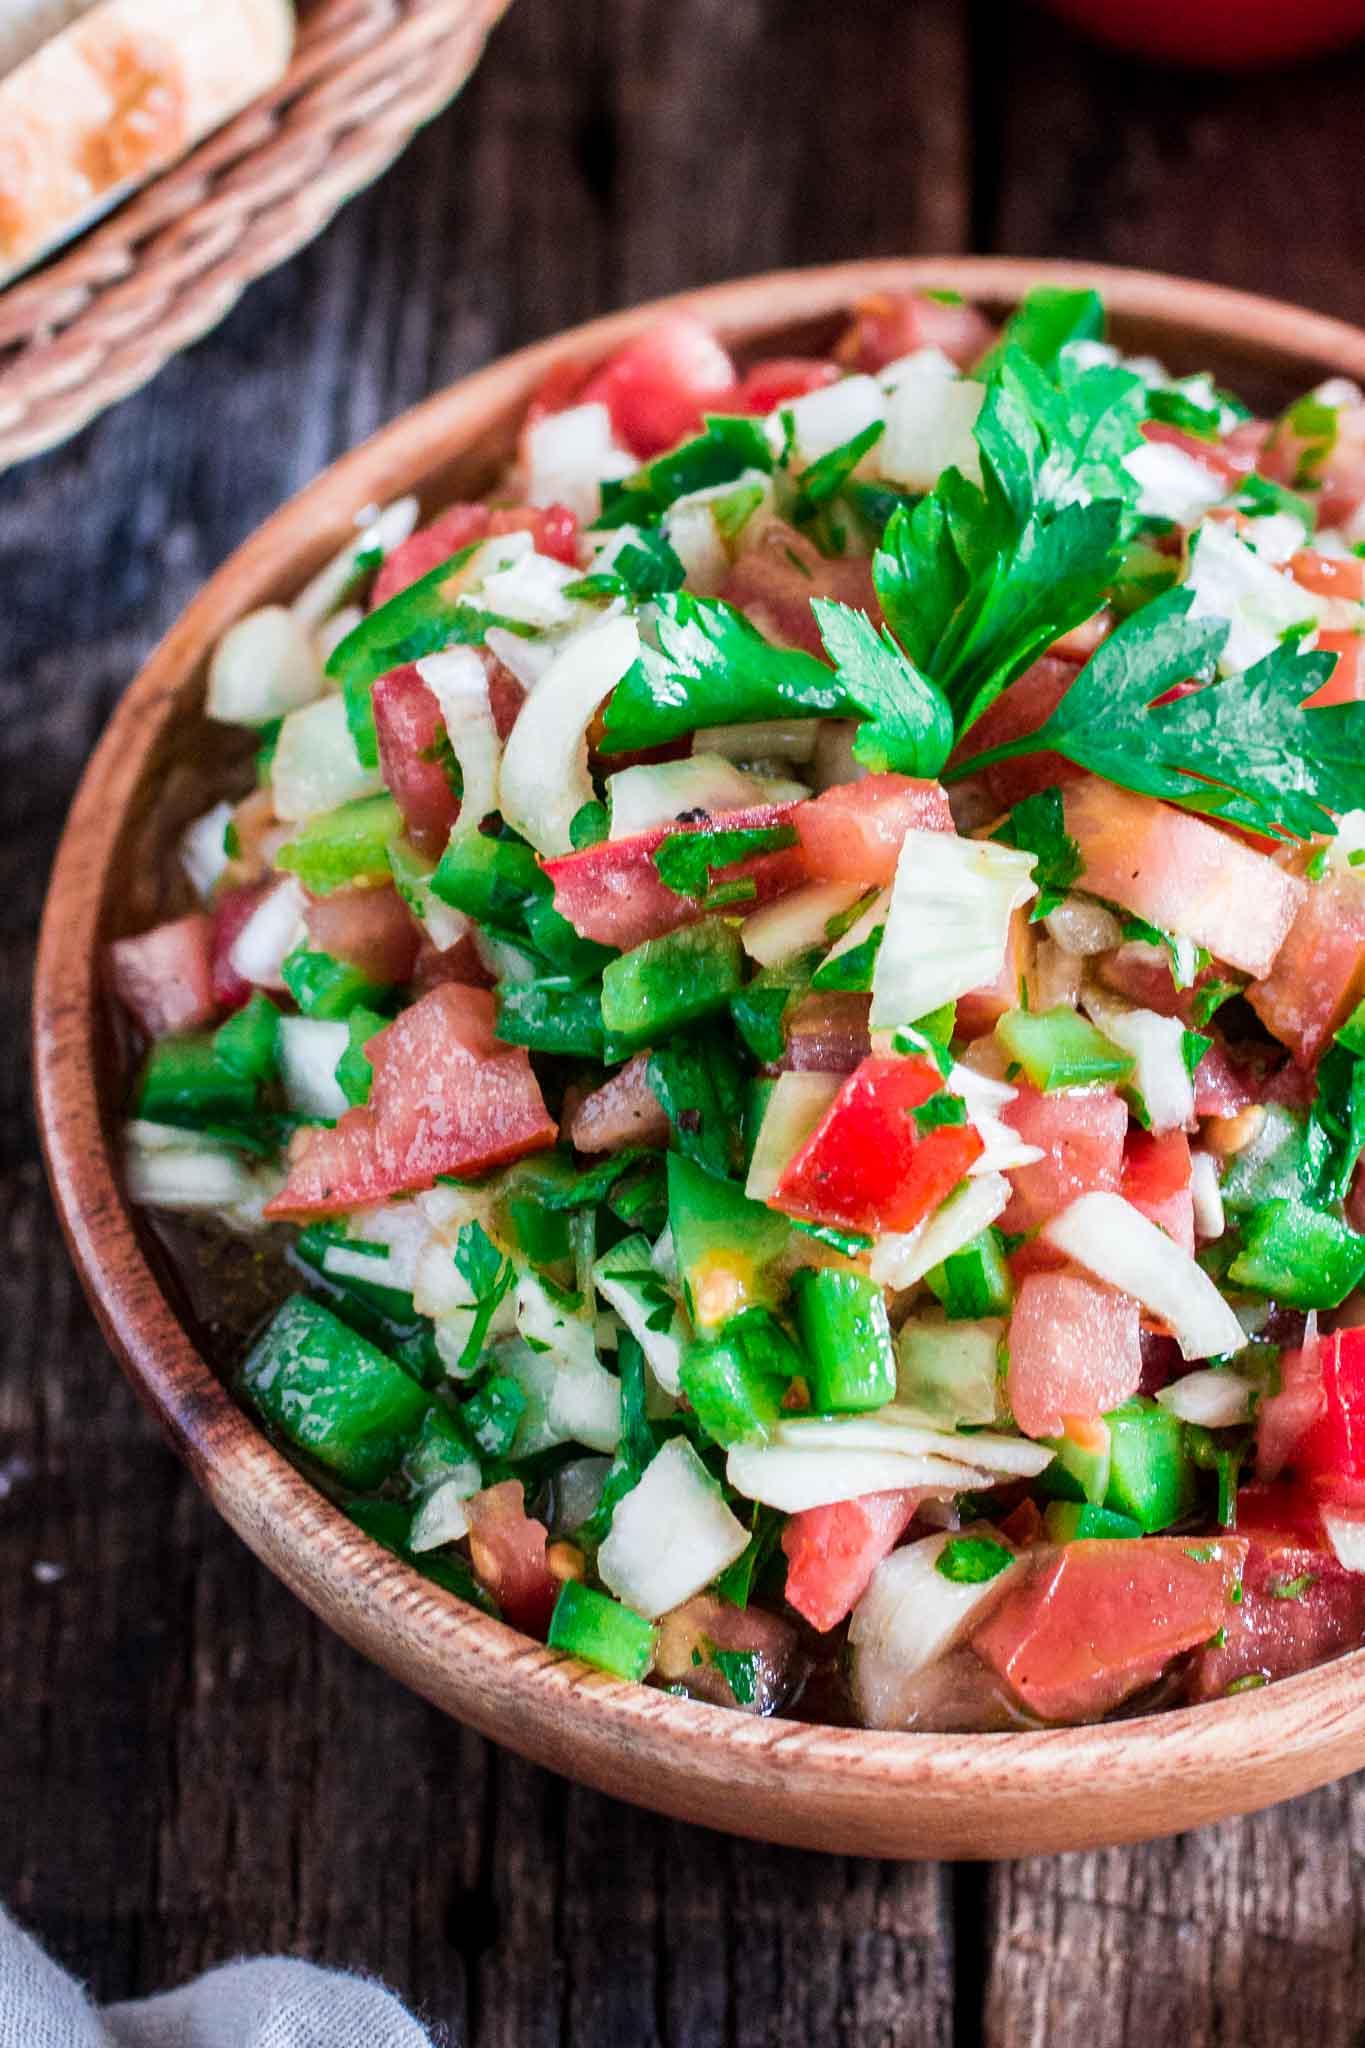 Vinagrete (Brazilian tomato salad)